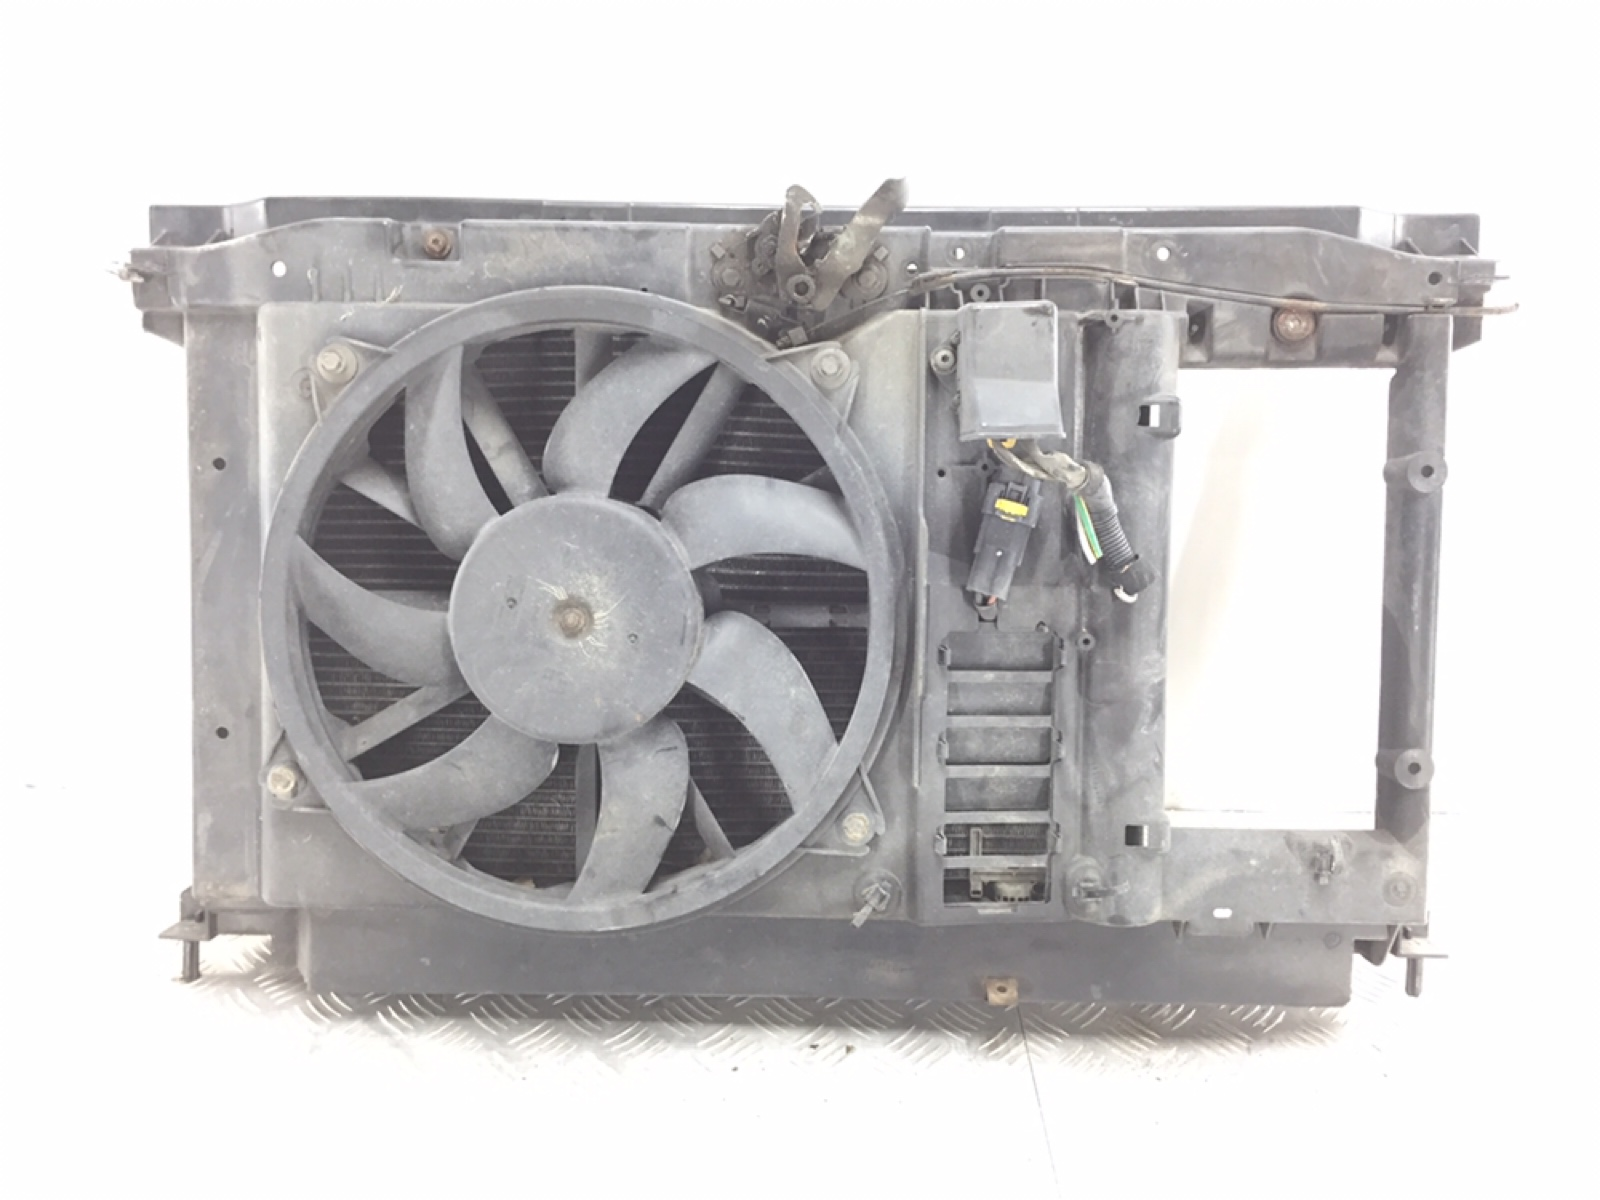 Кассета радиаторов Peugeot 307 CC 2.0 HDI 2006 (б/у)